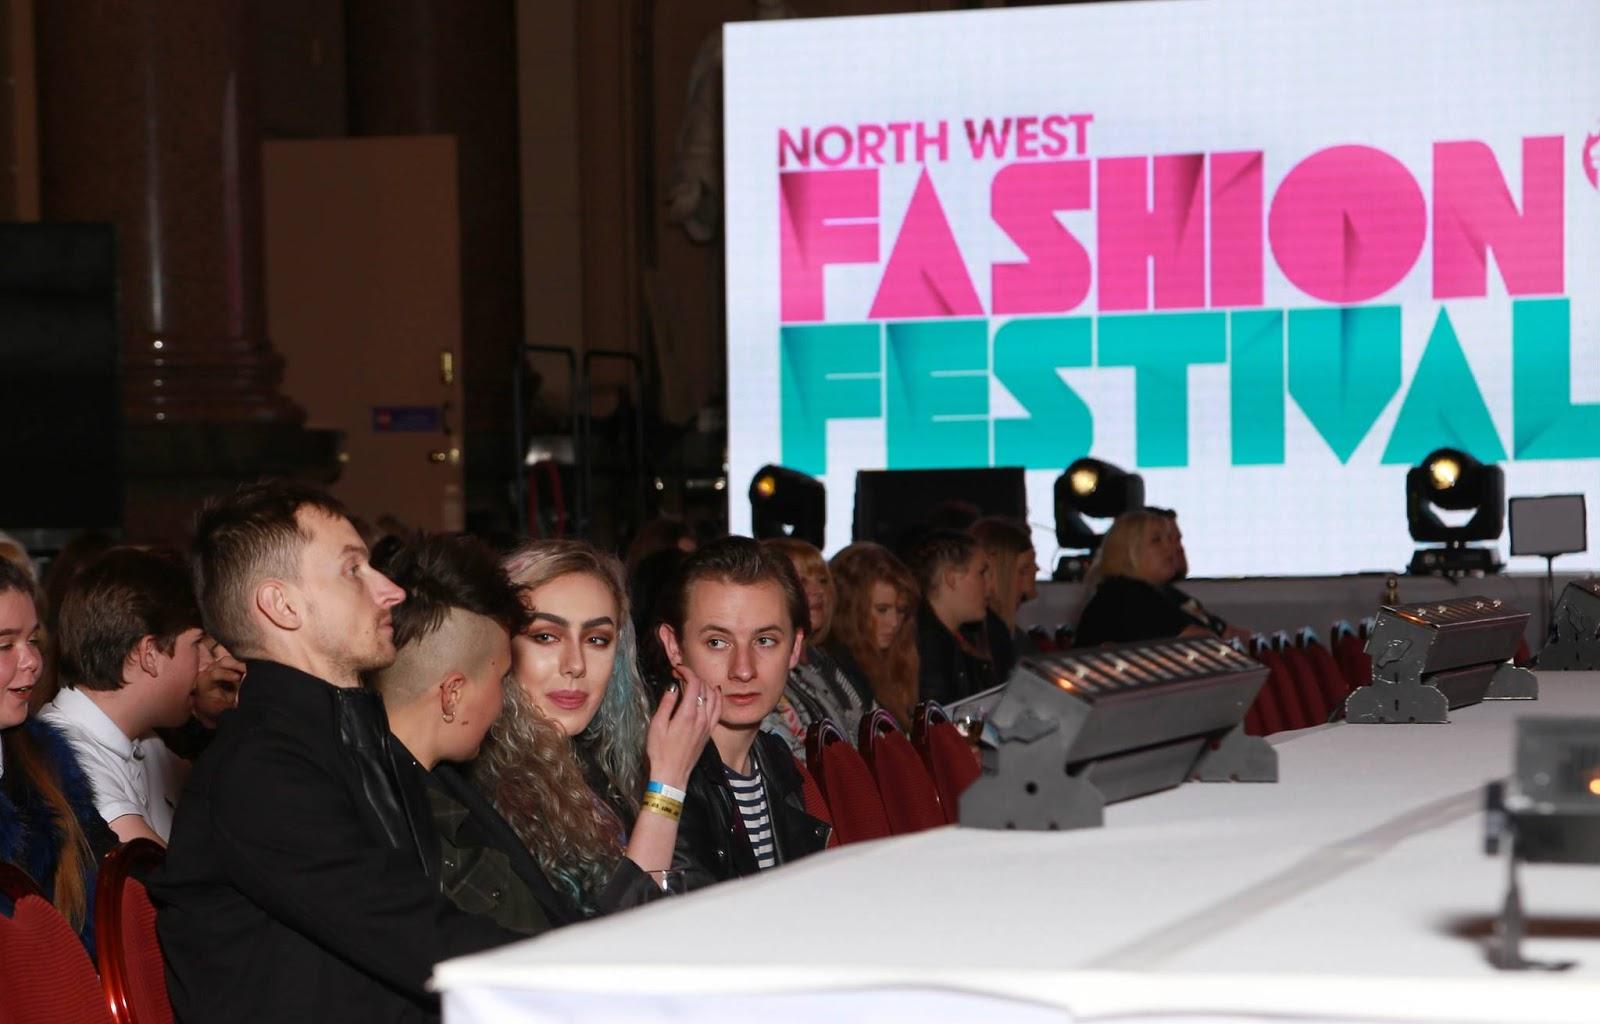 Stephi LaReine catwalk front row North West Fashion Festival 2016